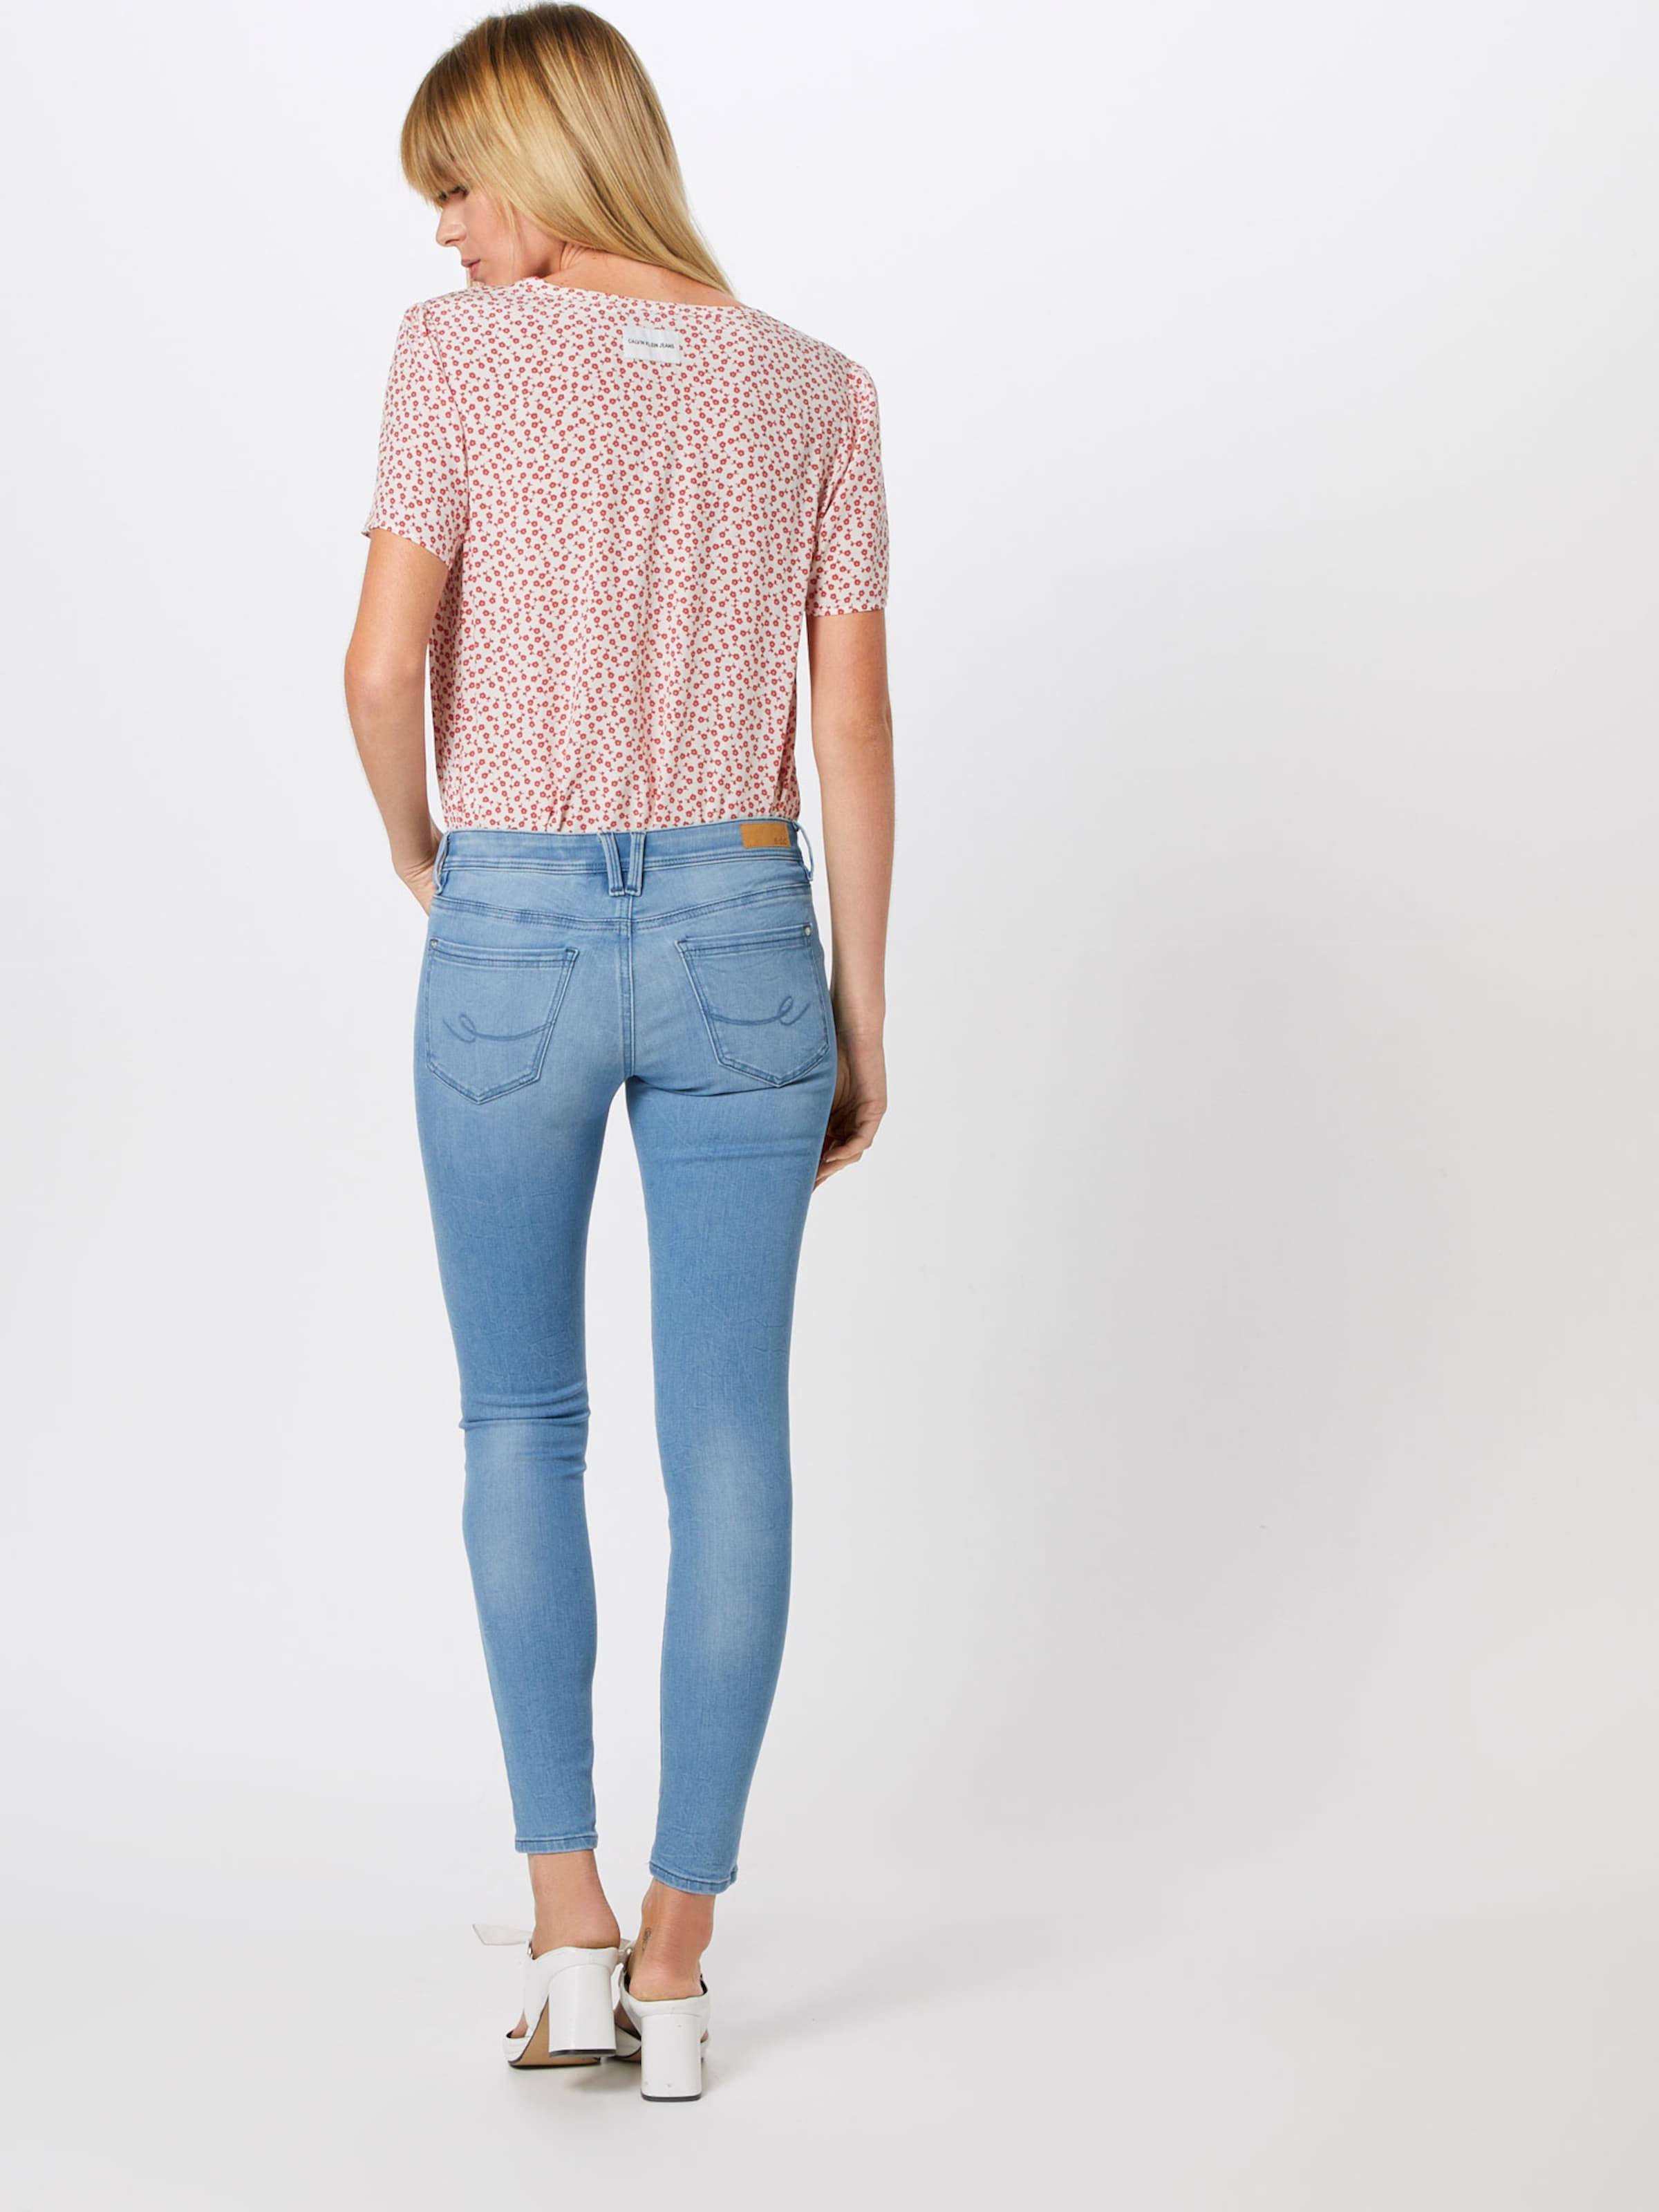 Esprit By In Edc Jeans 'rcs Blauw Lr' Denim 0OkwnP